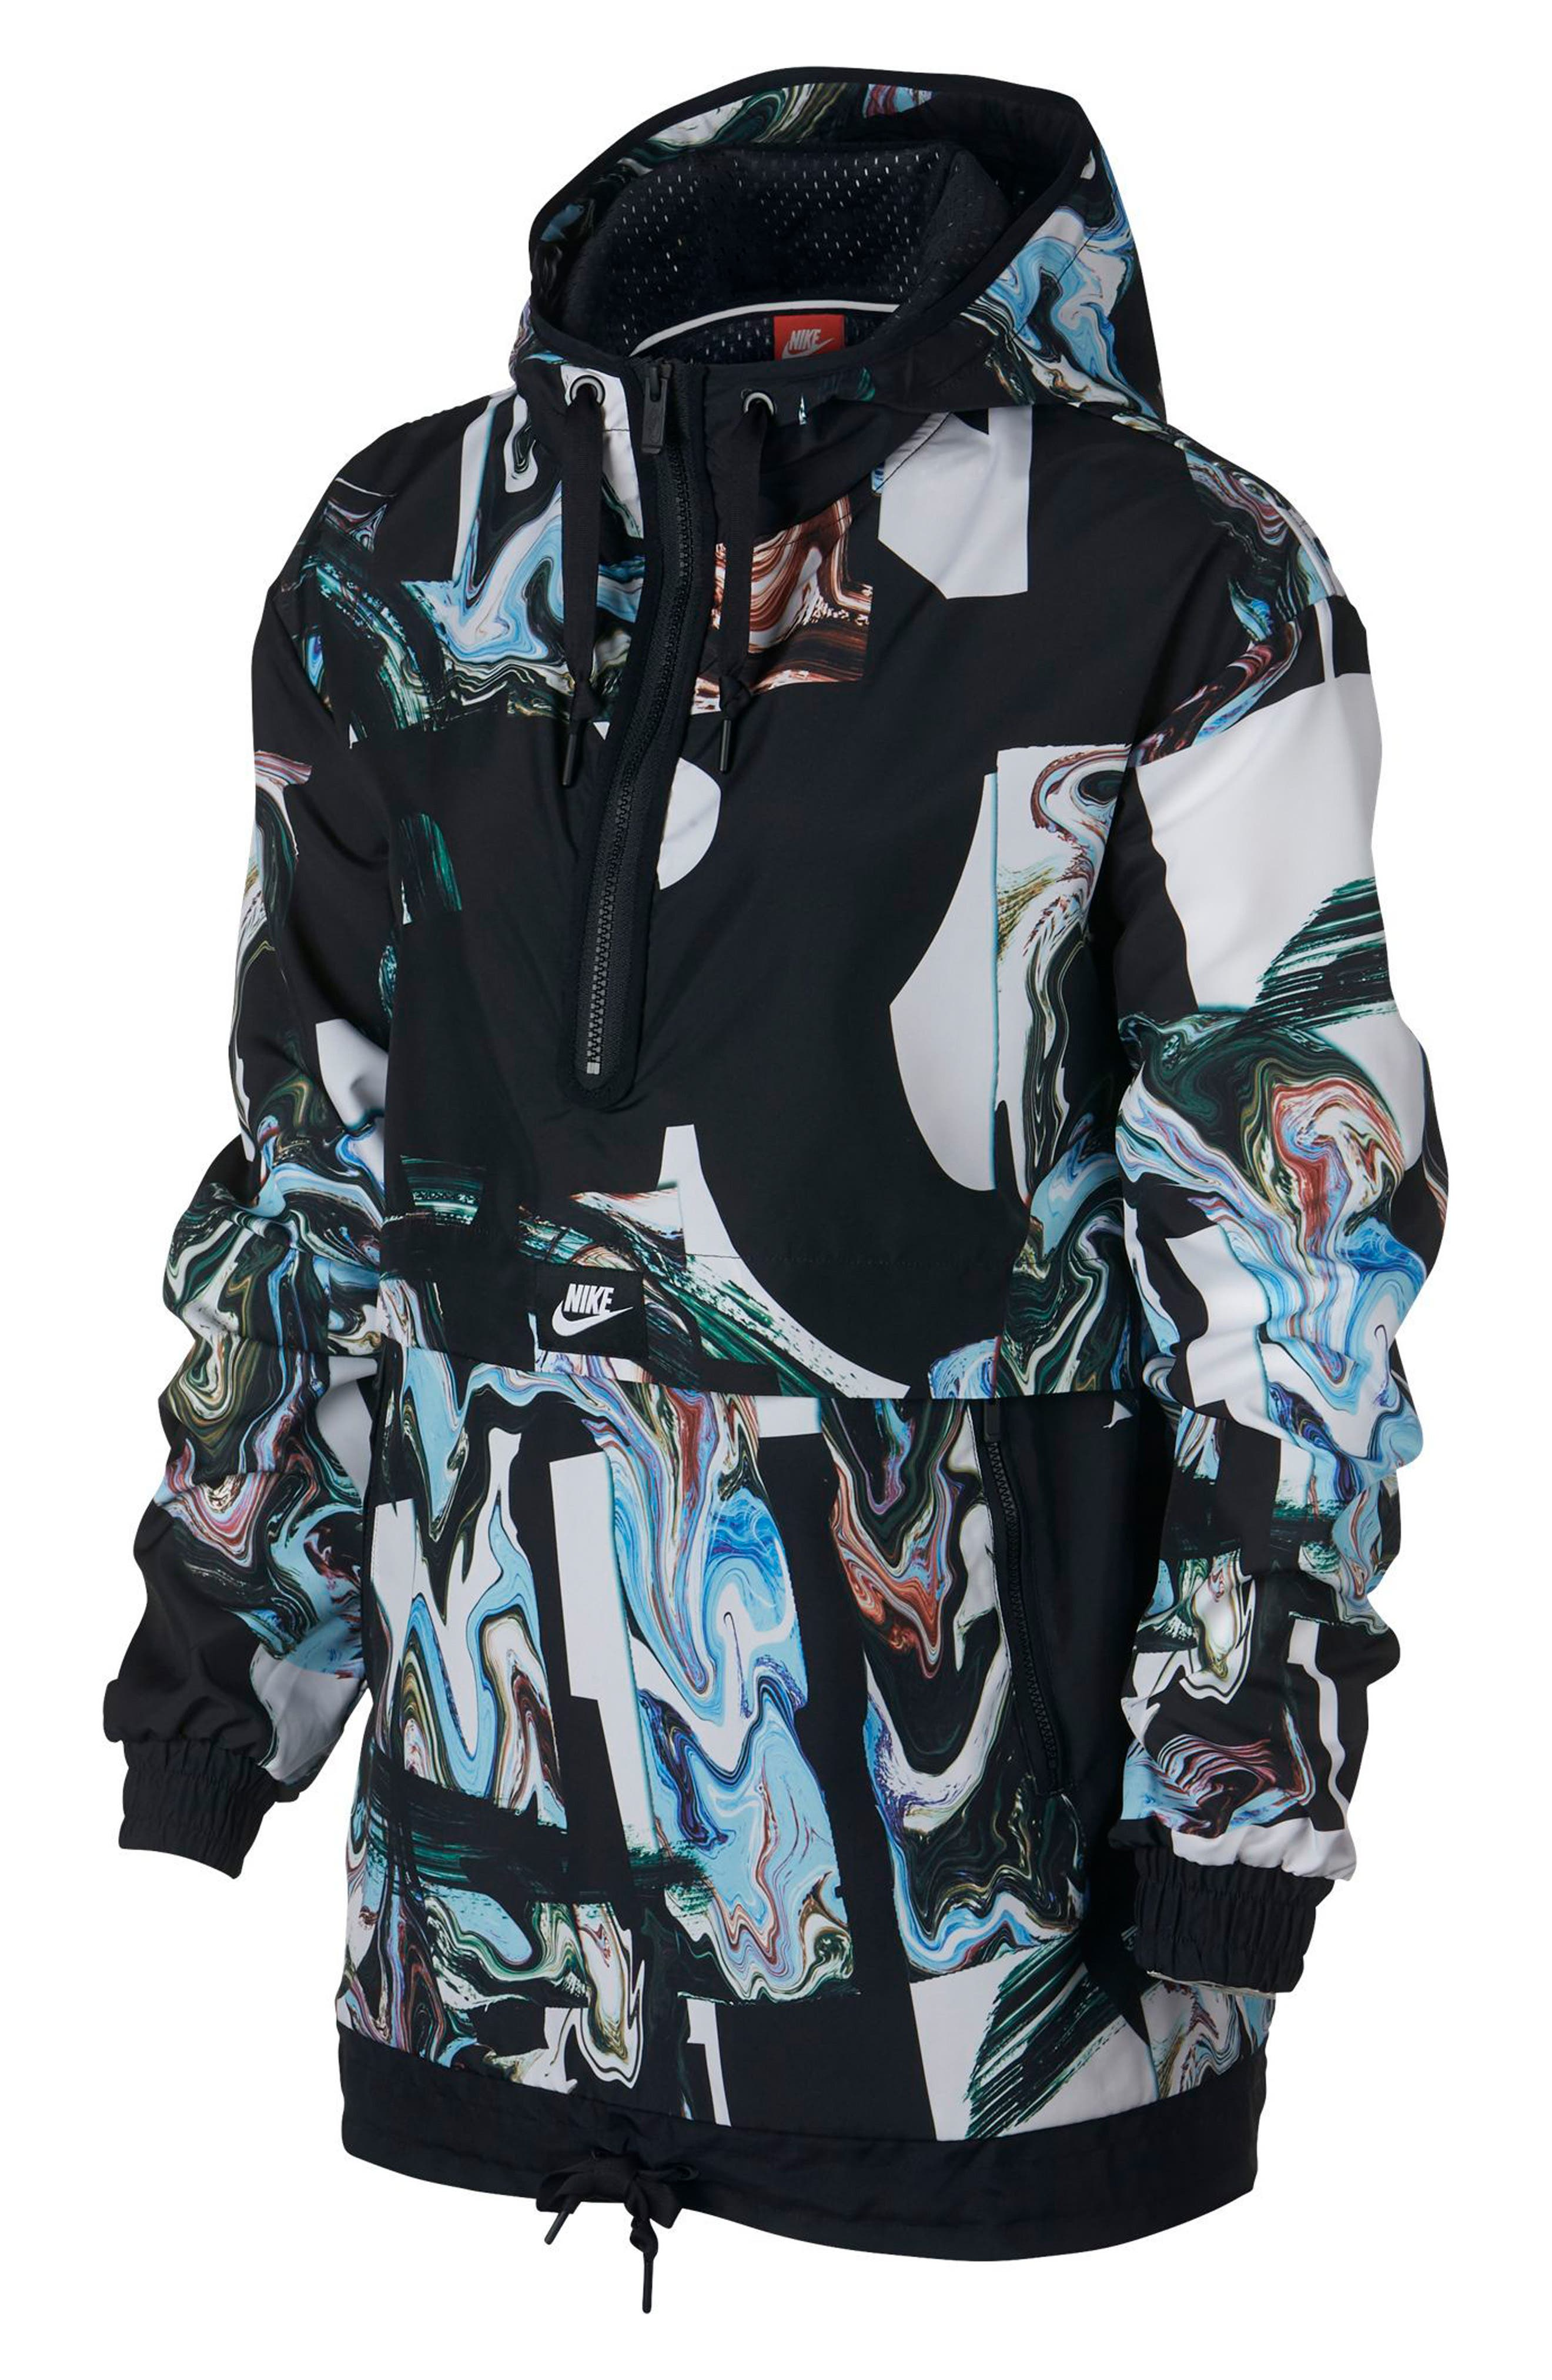 Sportswear Women's Marble Print Hooded Jacket,                             Main thumbnail 1, color,                             Black/ Black